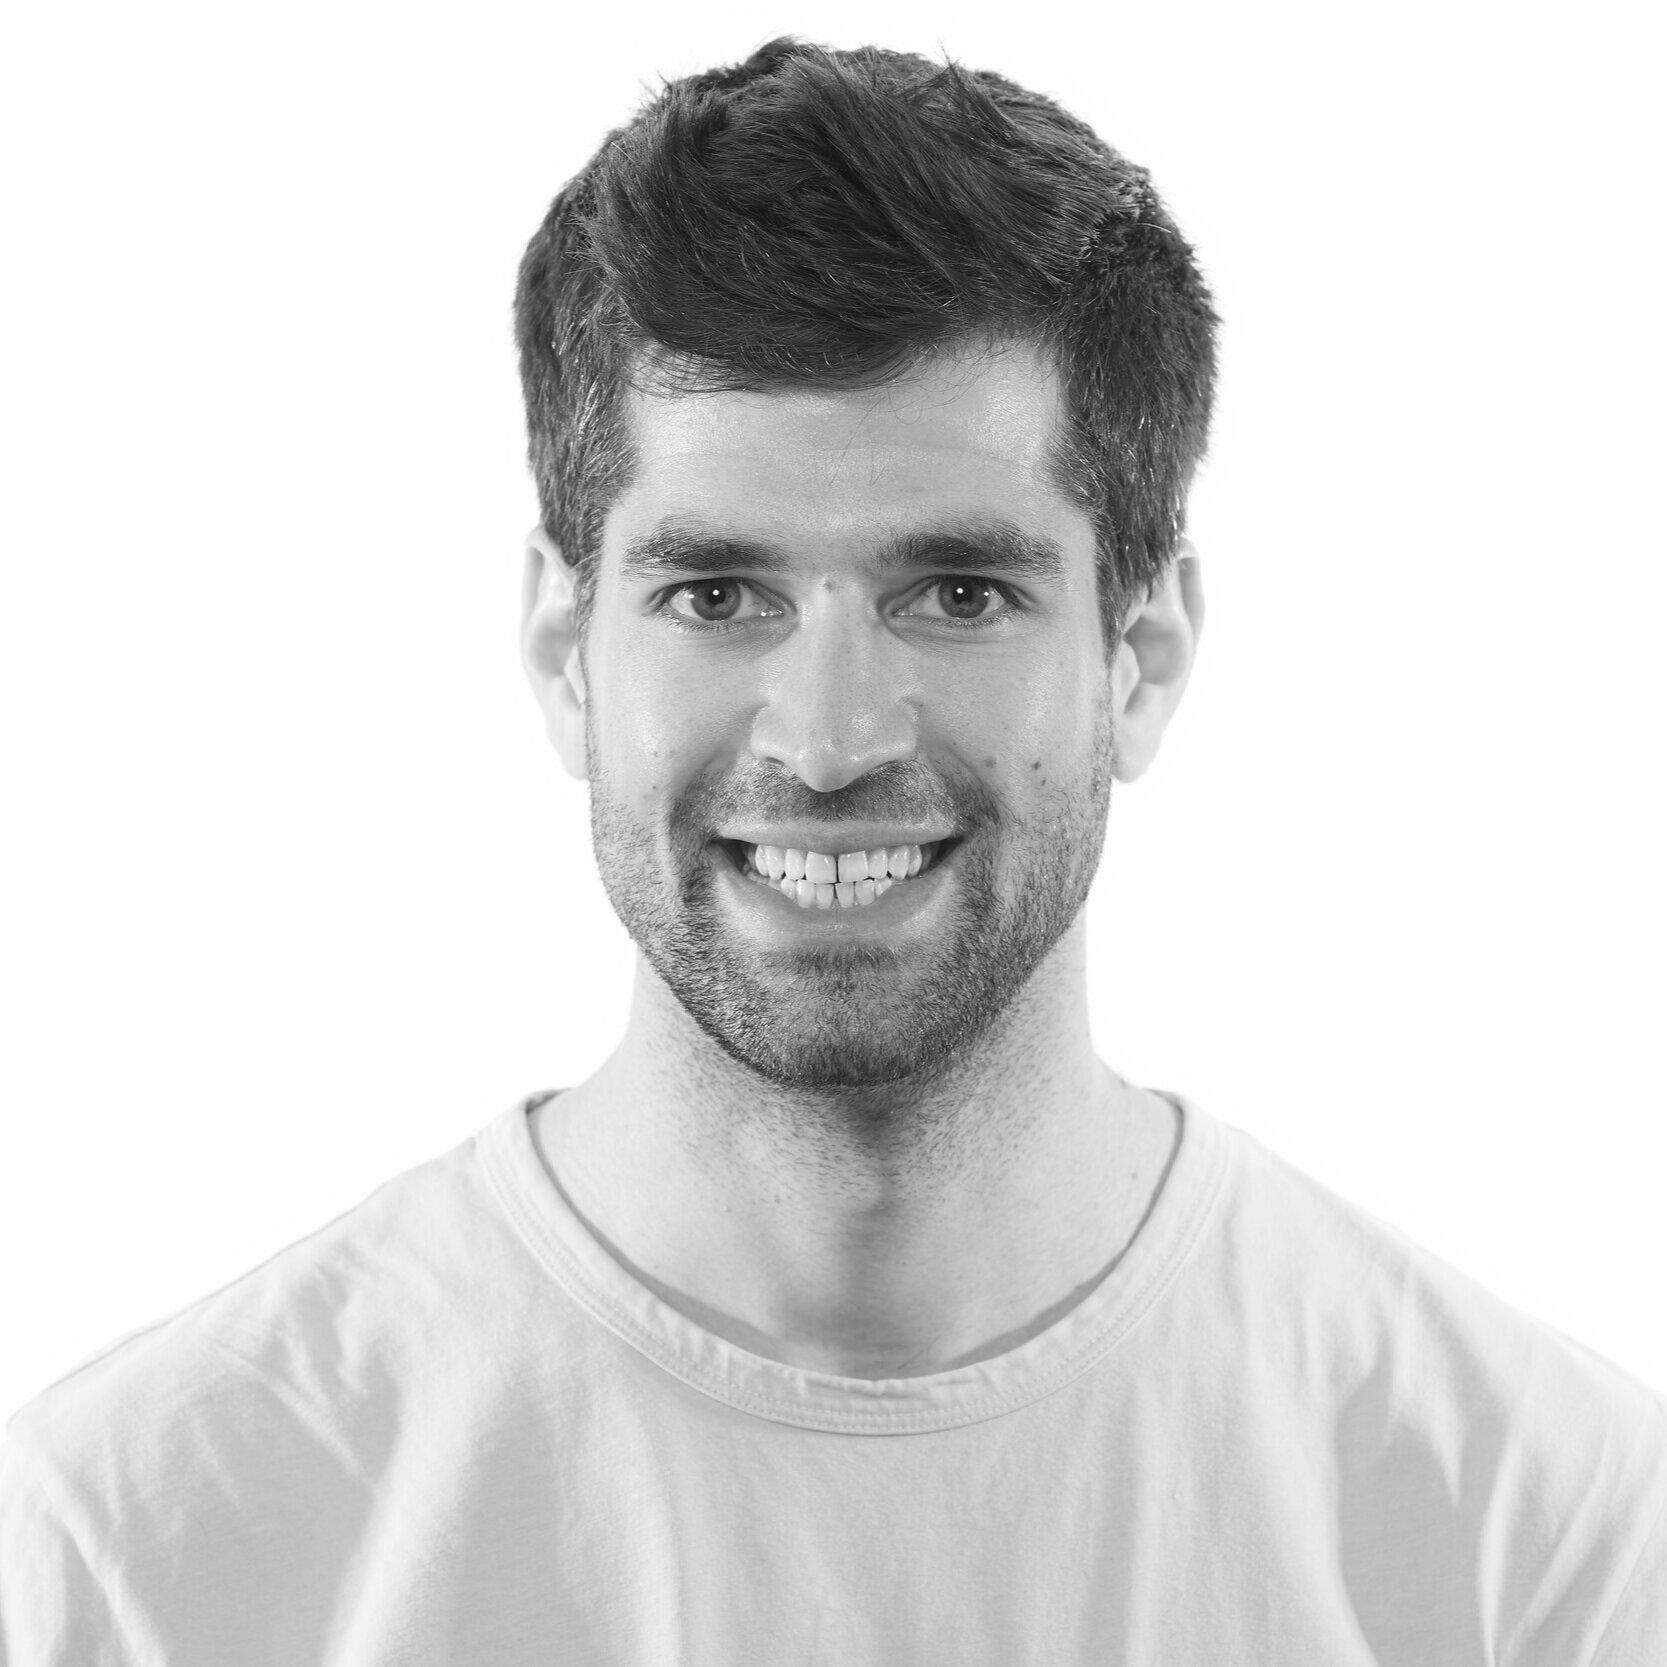 Jon Morgenstern - SVP, Head of Investment @ VaynerMedia